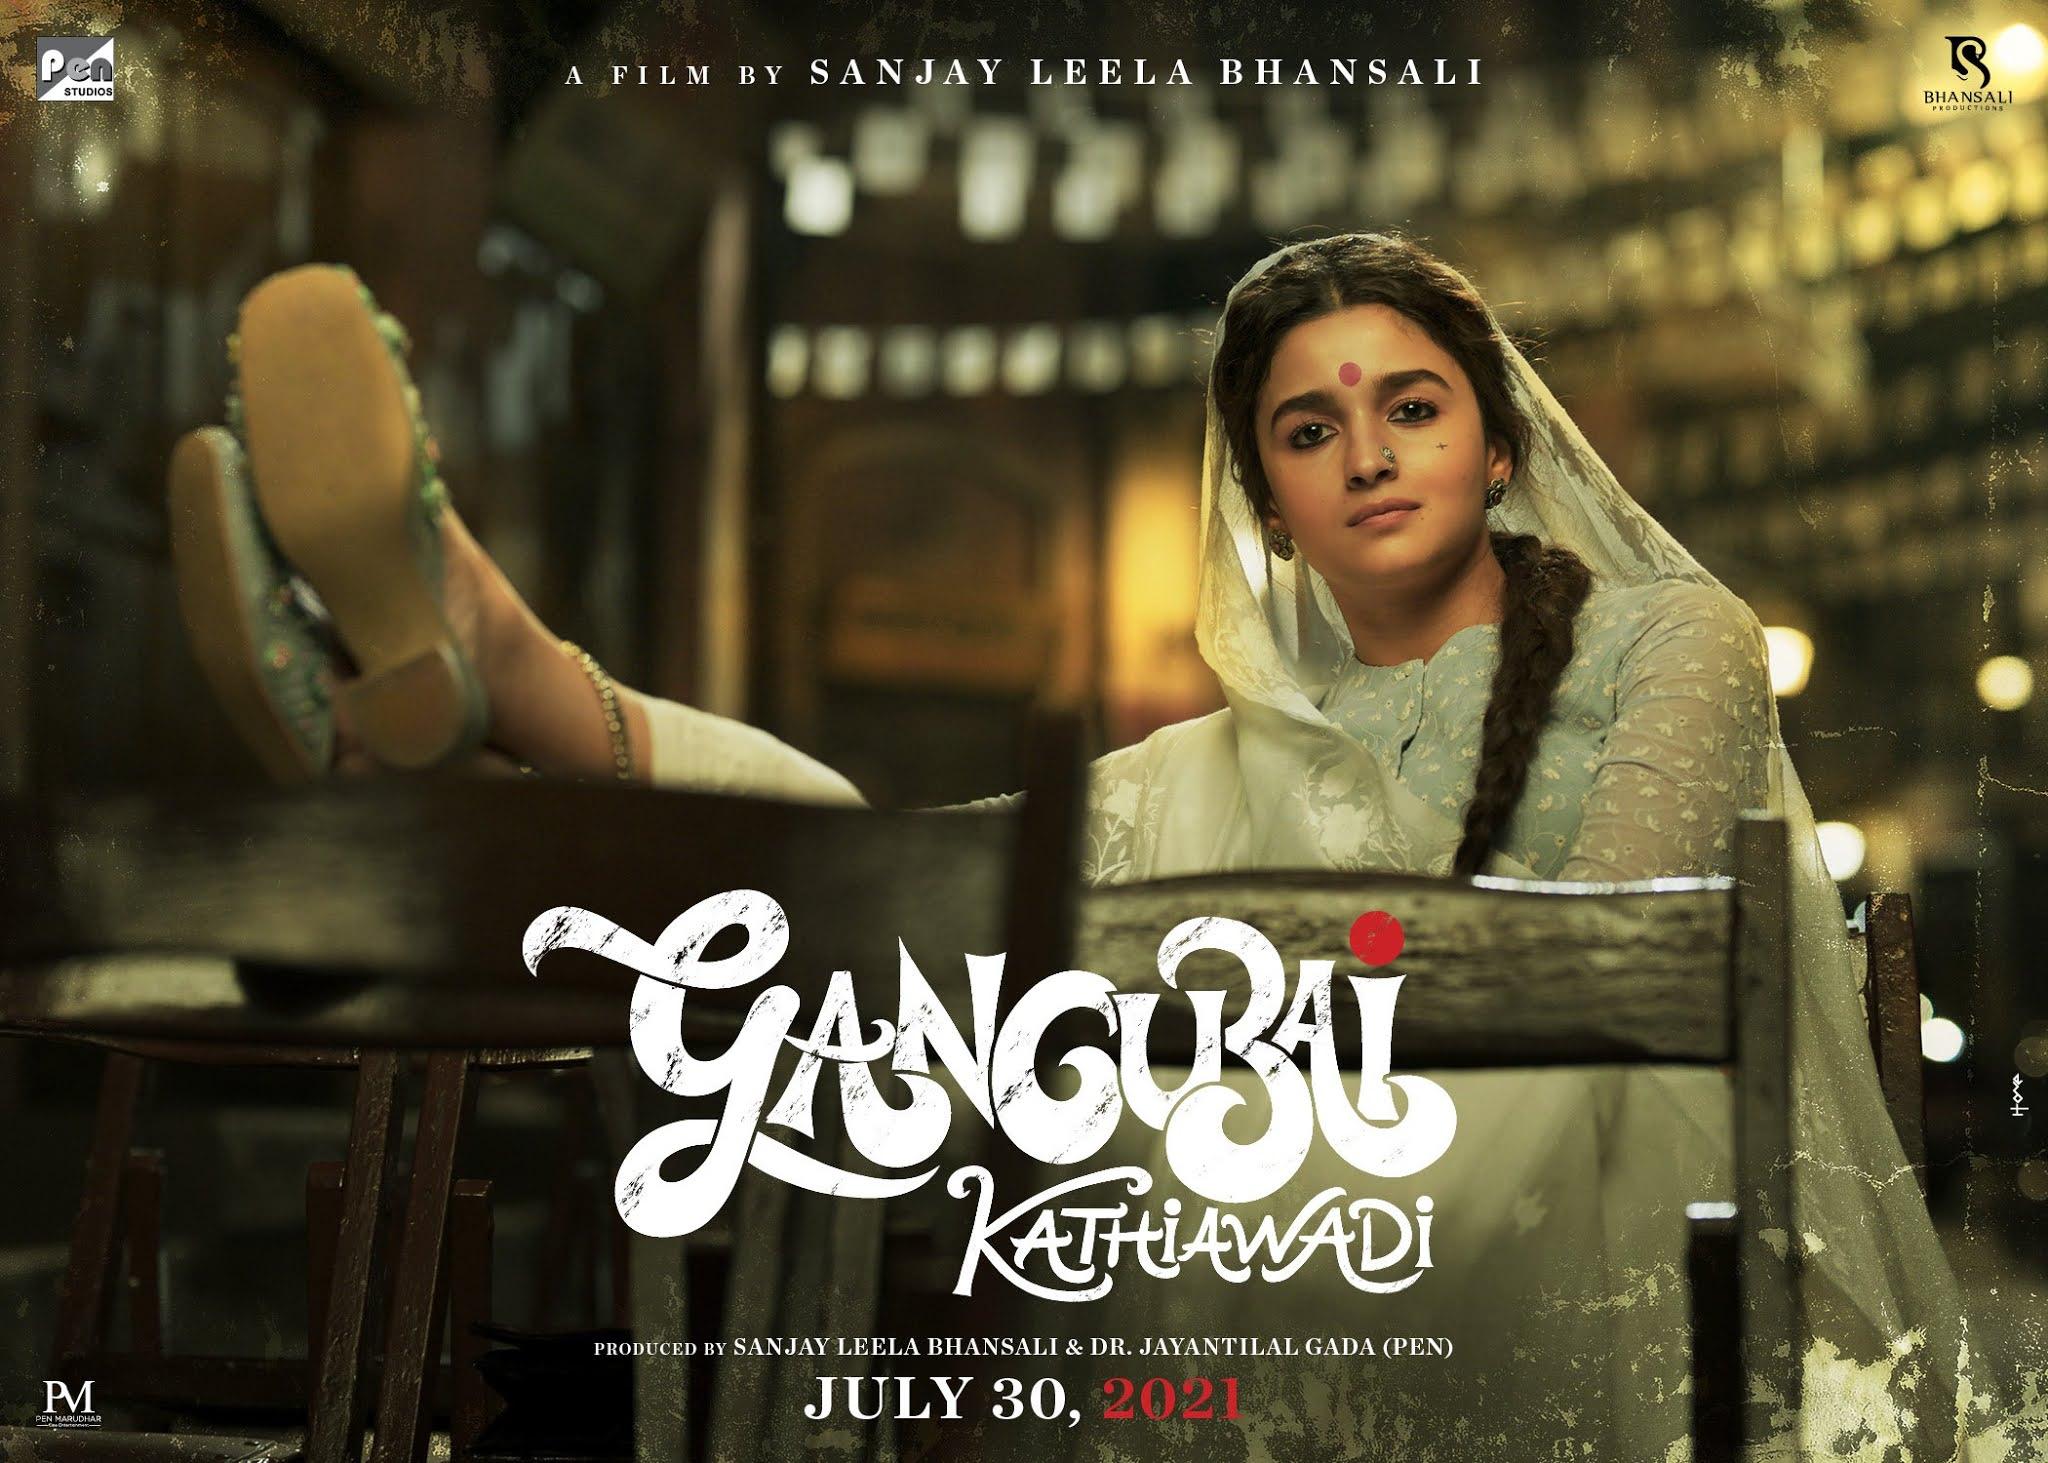 Gangubai kathiawadi OTT release date, Alia Bhatt, Sanjay Leela Bhansali – .